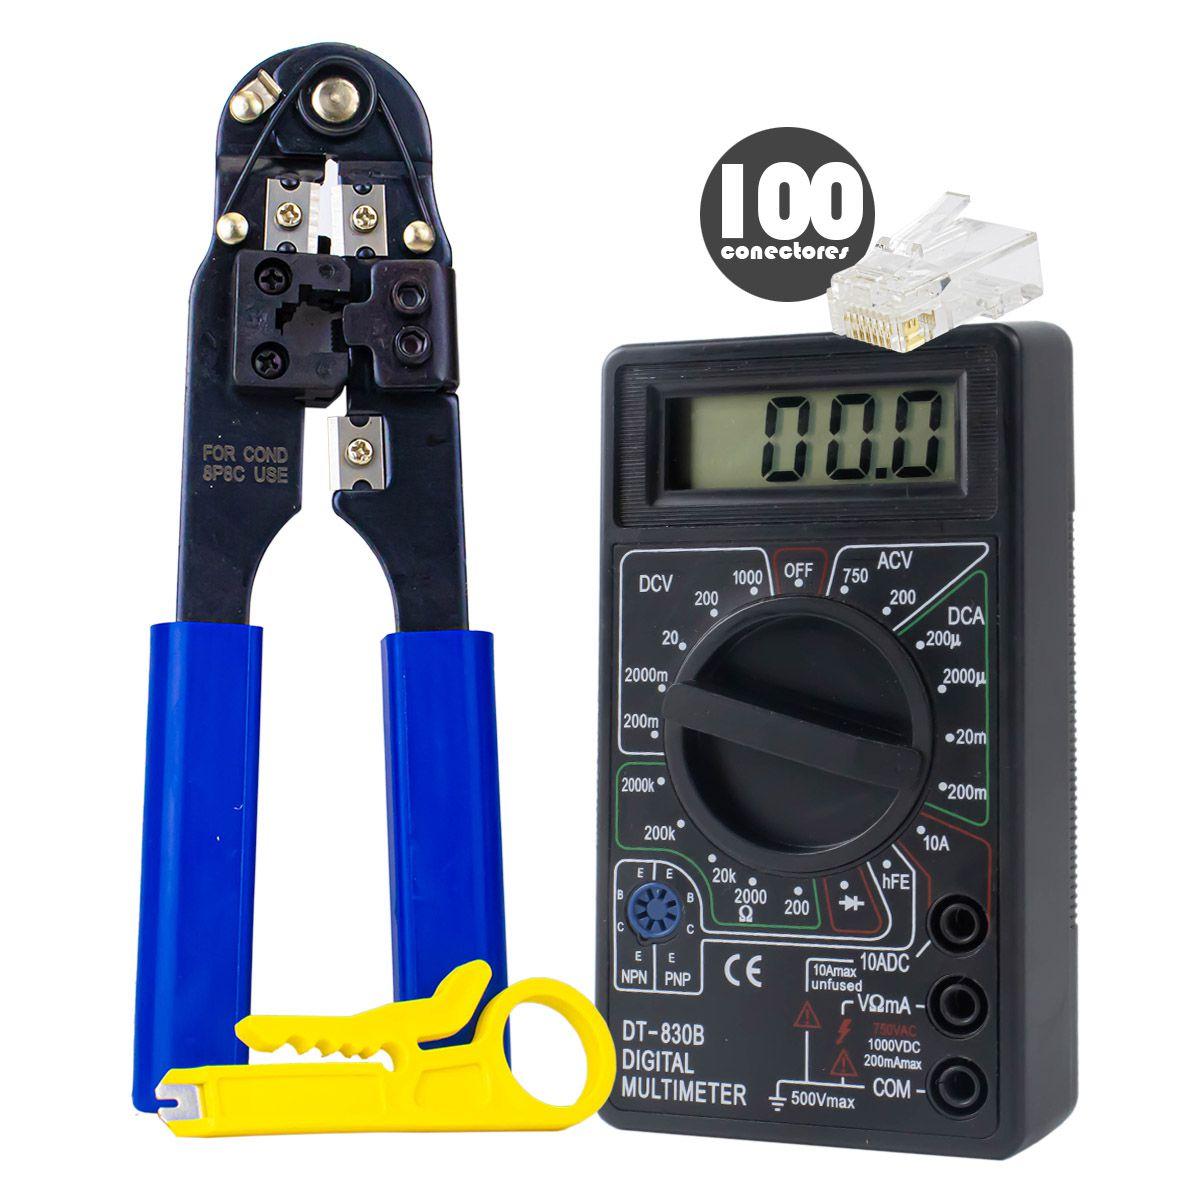 KIT Alicate de Crimpar 210c + 100x Conectores RJ45 + Multímetro Digital XT-573